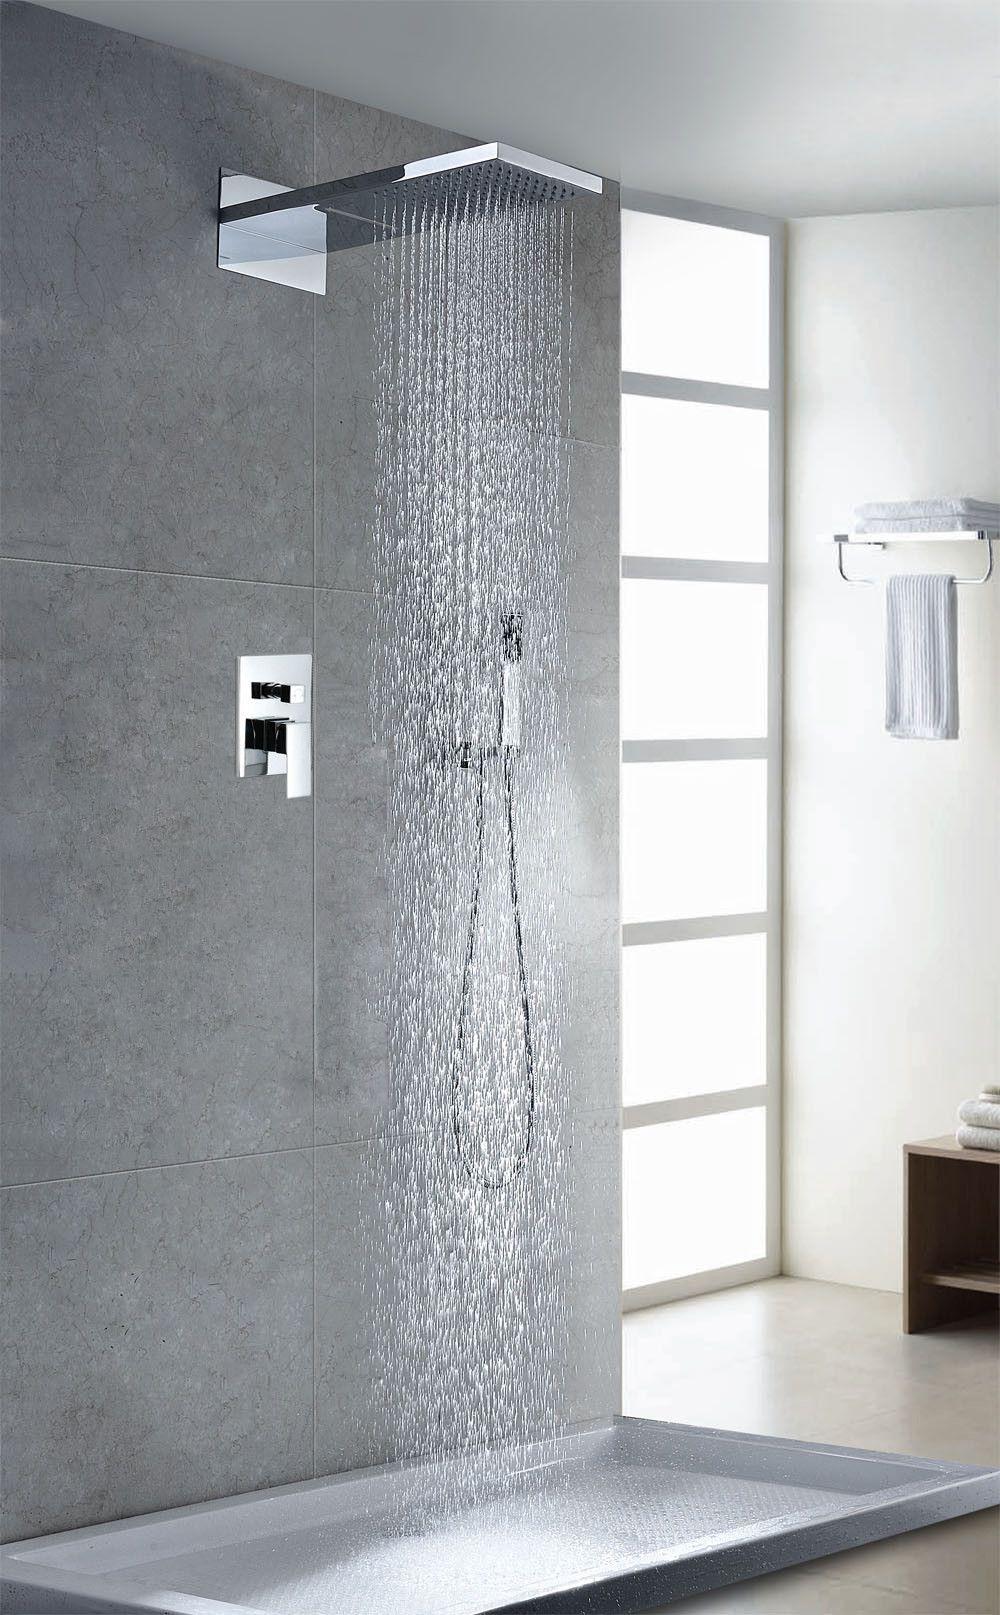 Contemporary Modern Volume Control Rain Shower Head